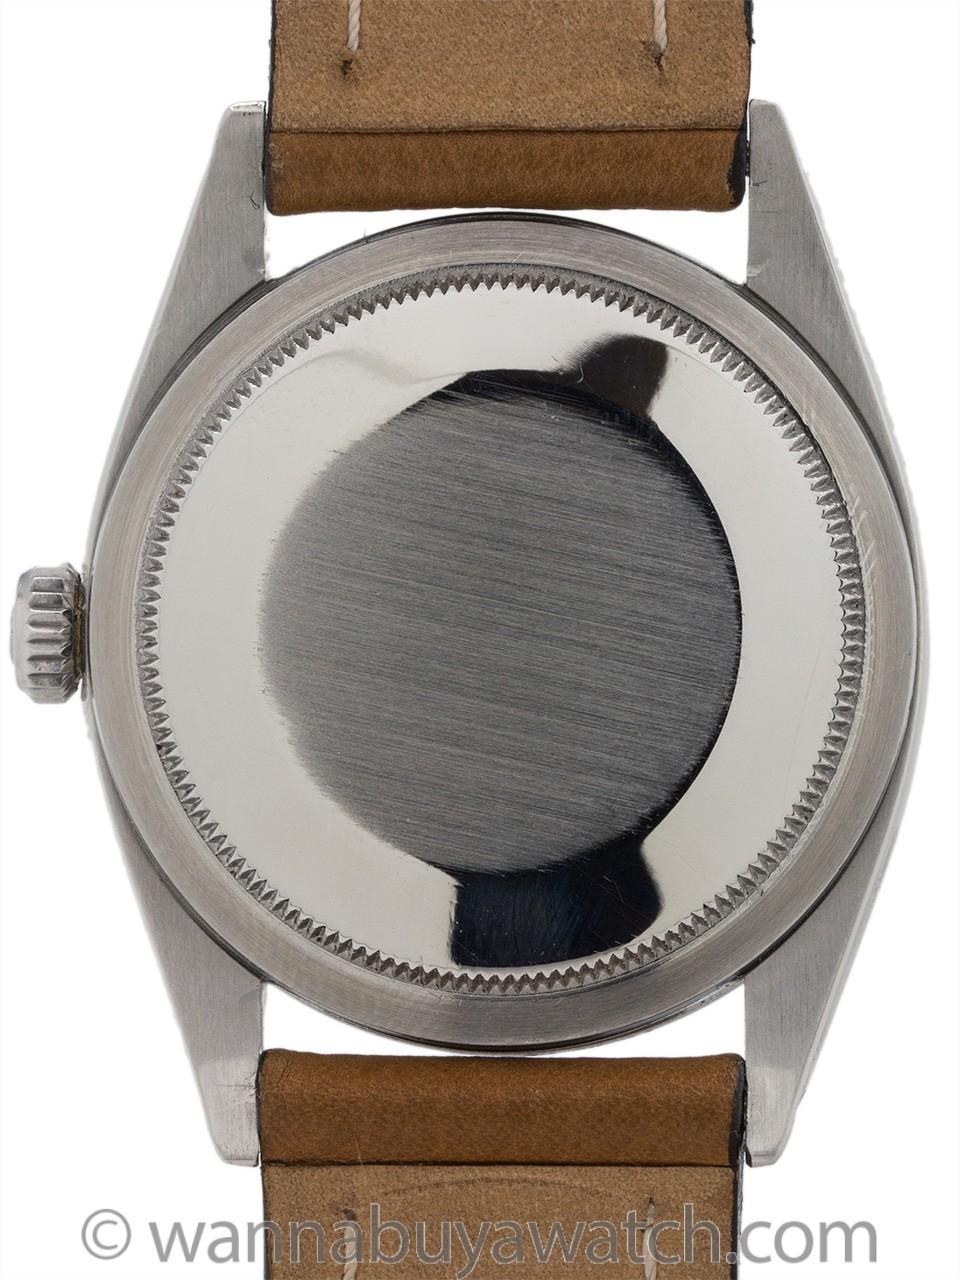 Rolex Explorer 1 ref 1016 Gilt Dial Exclamation Point circa 1962